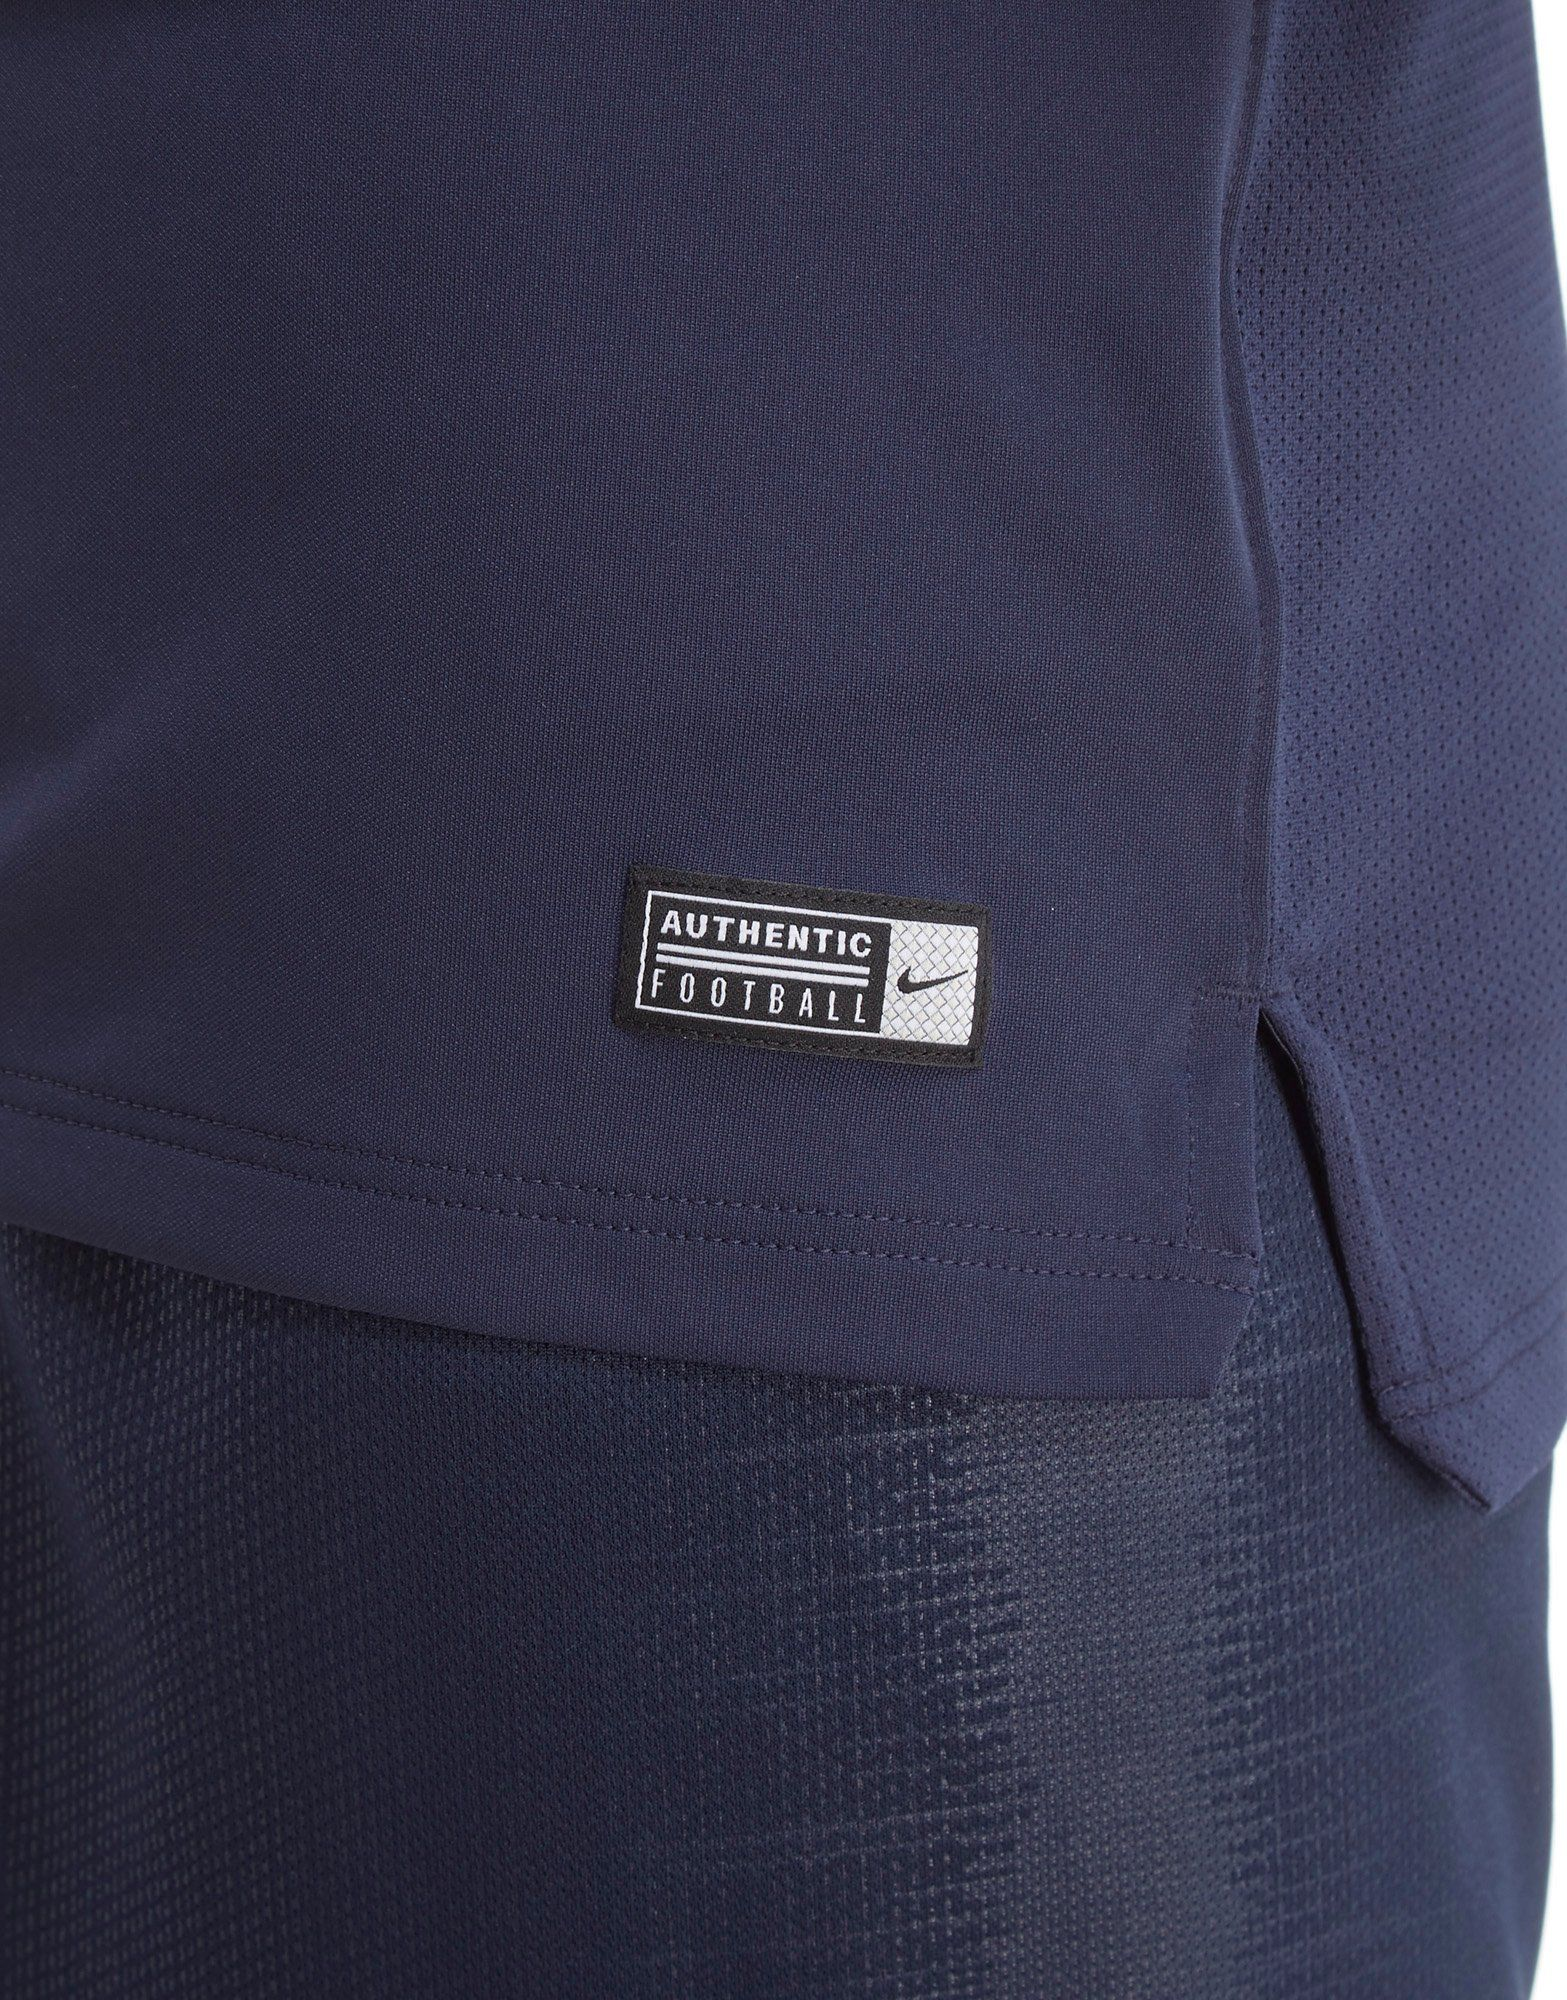 Nike Squad France France Nike Blau Training Jersey gxqHBfq